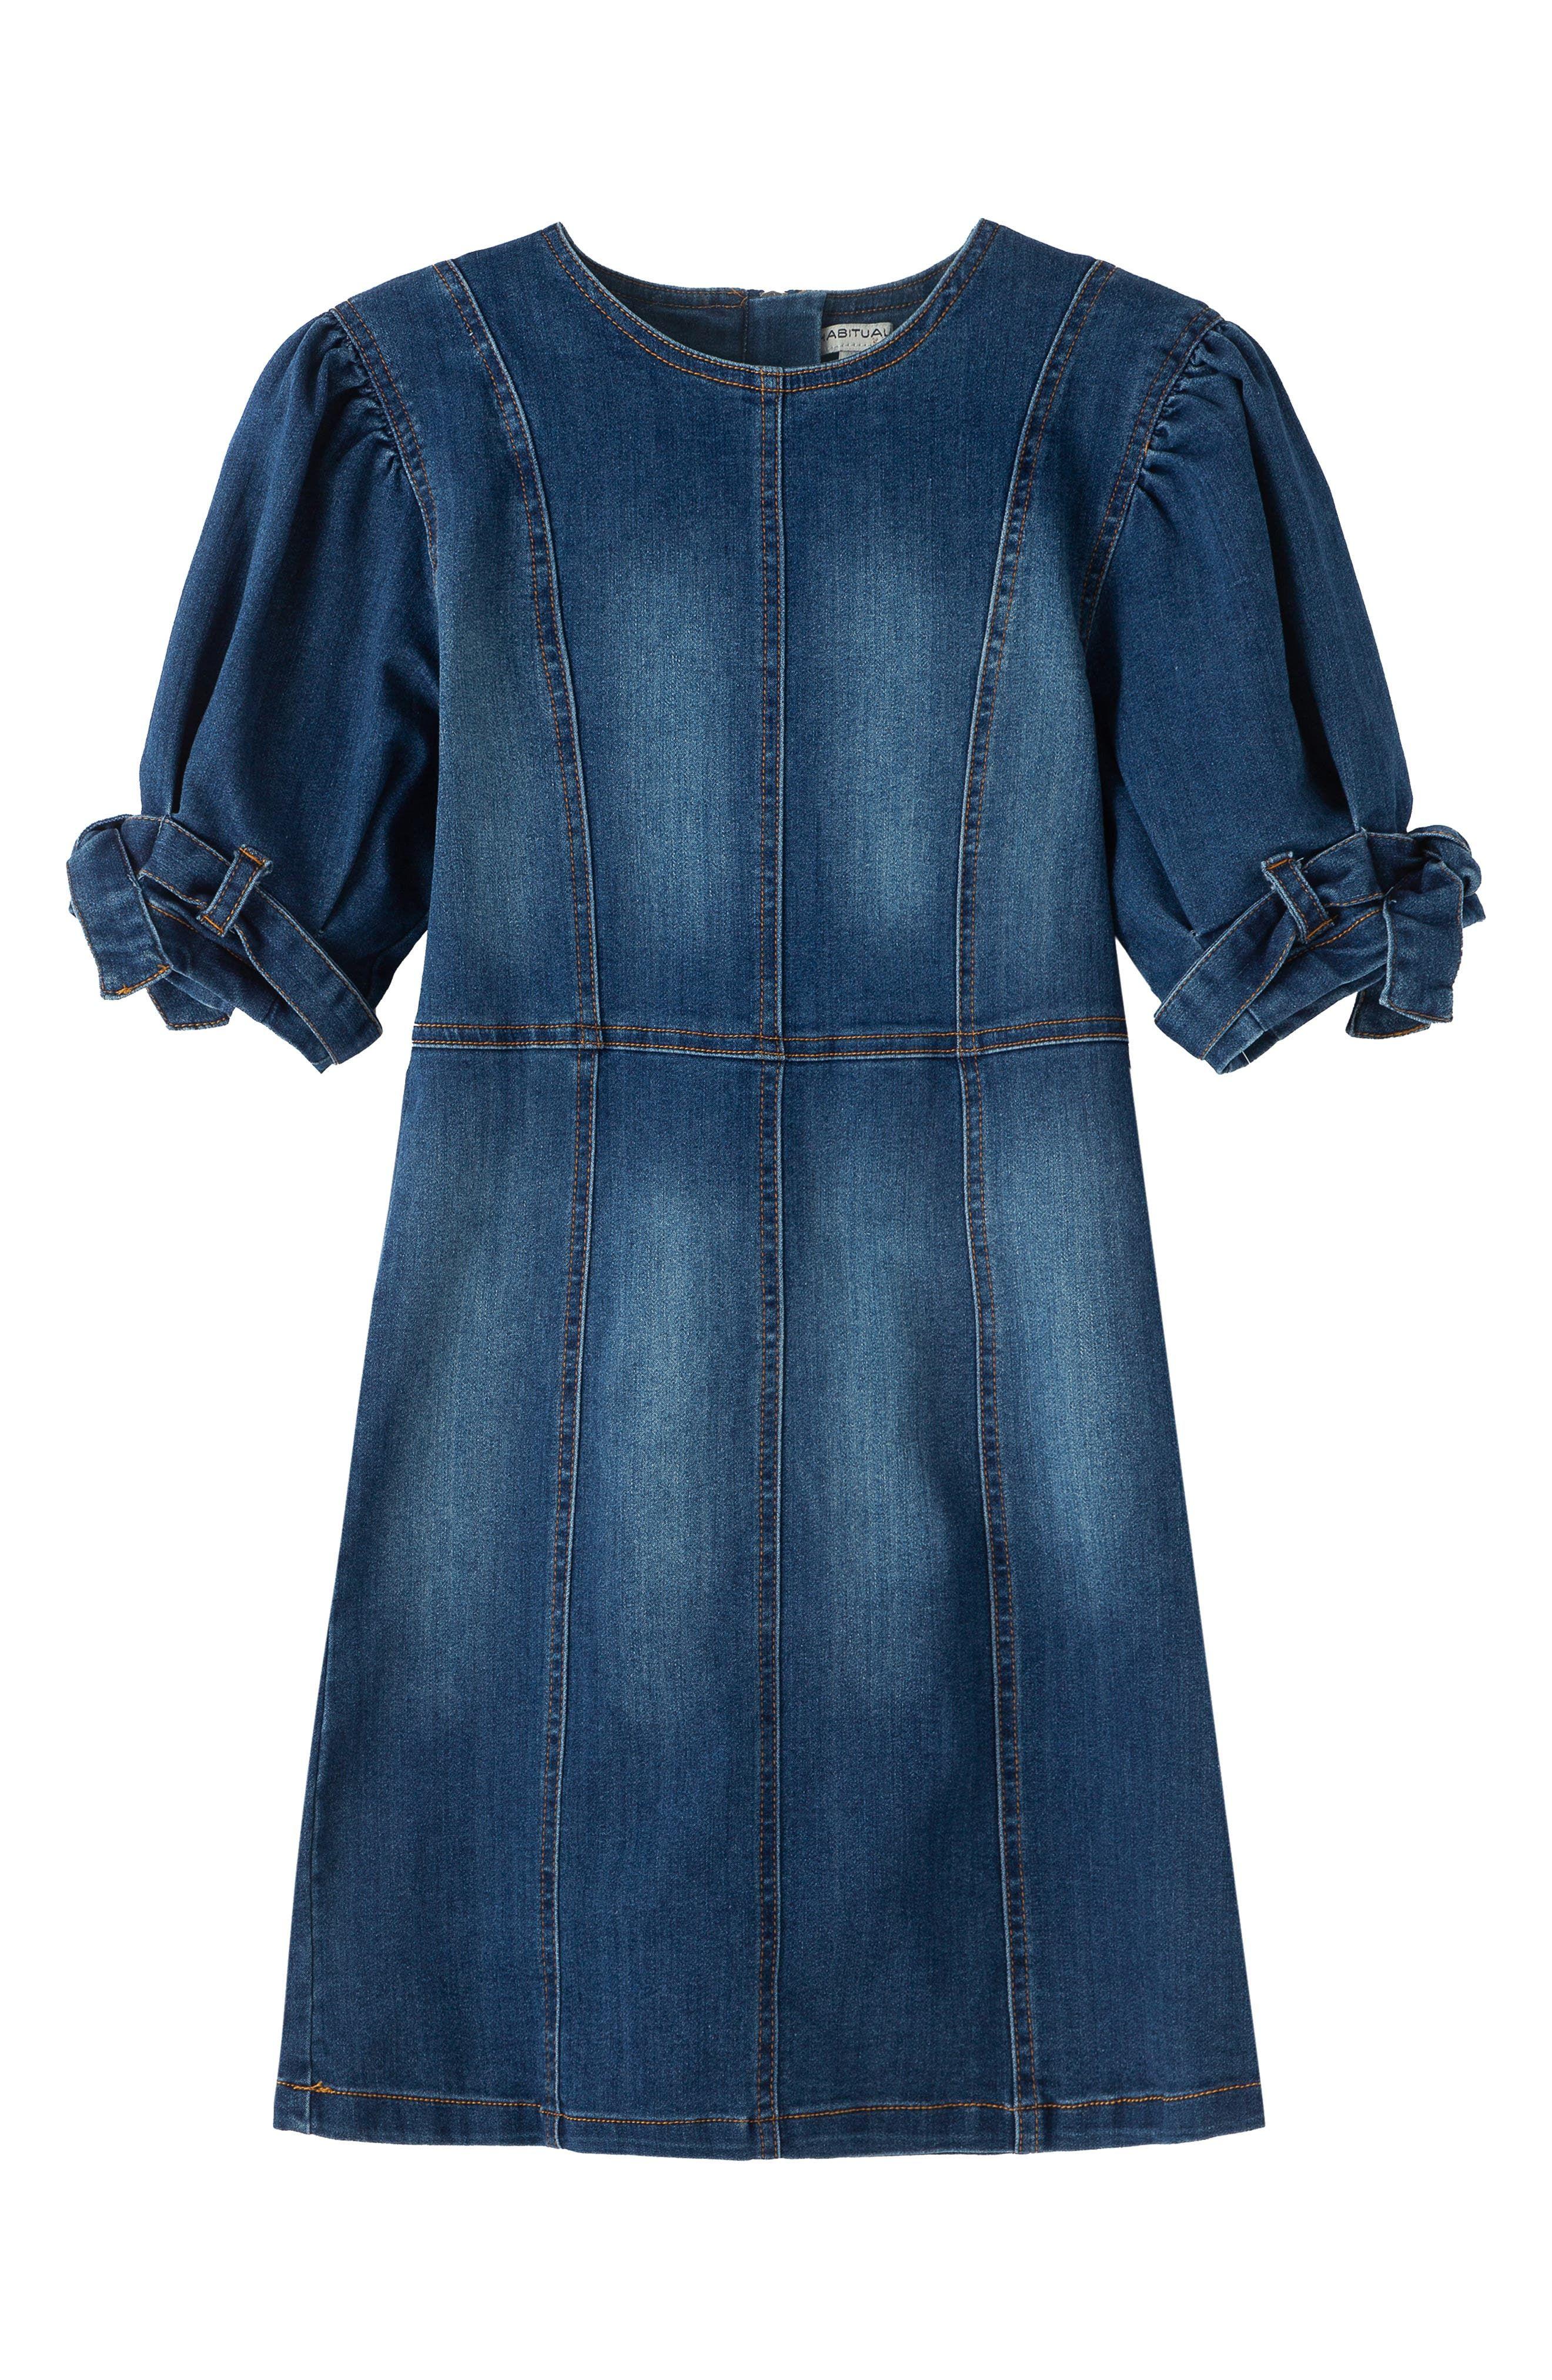 HABITUAL girl Girls Puff Sleeve Sweater Knit Dress Big Kids